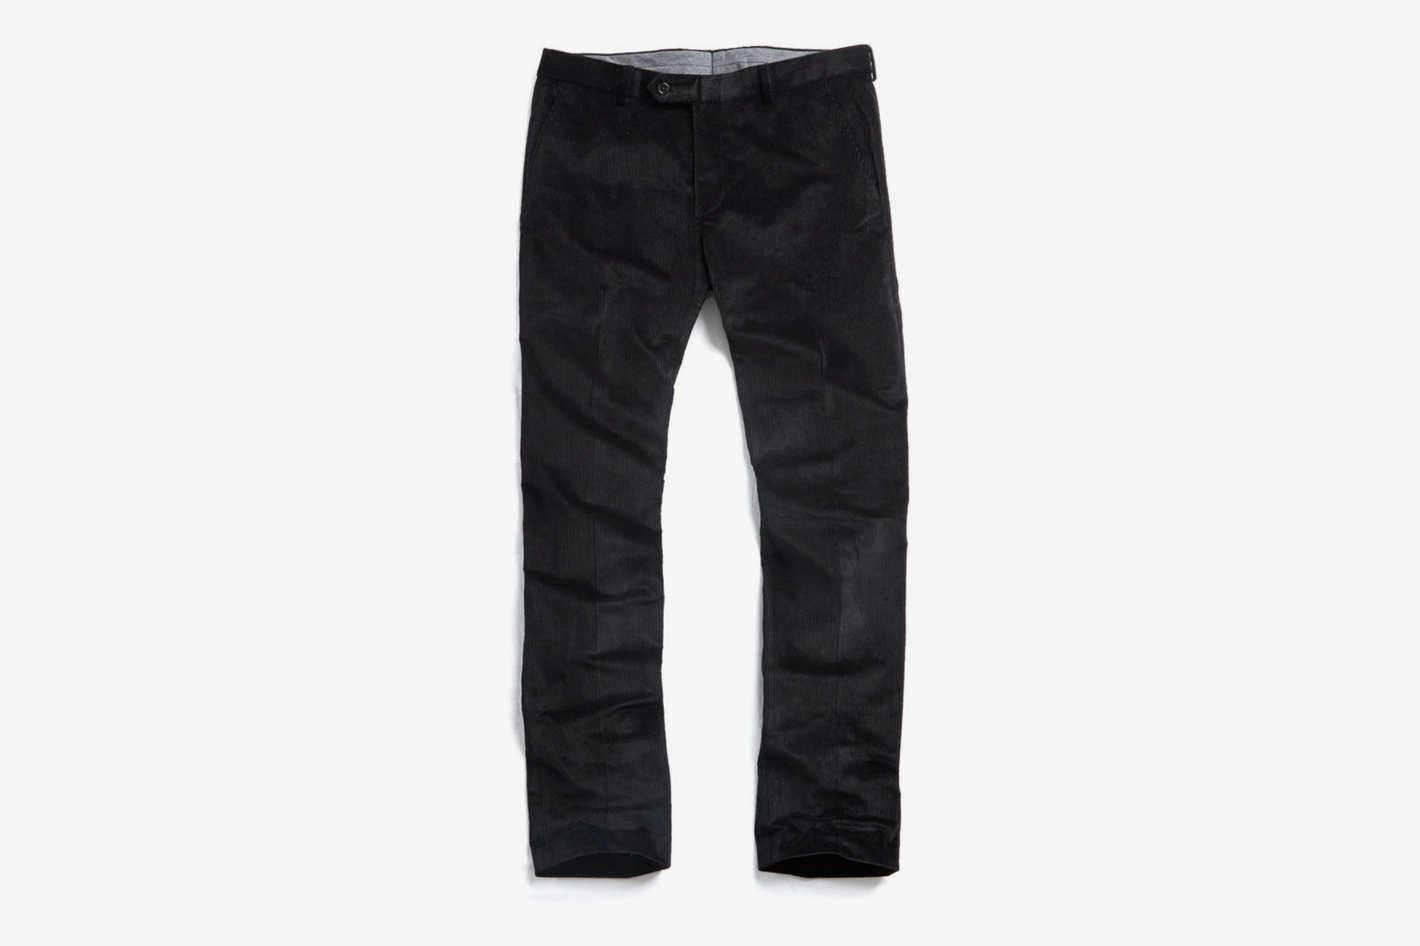 Sutton Corduroy Trouser in Black